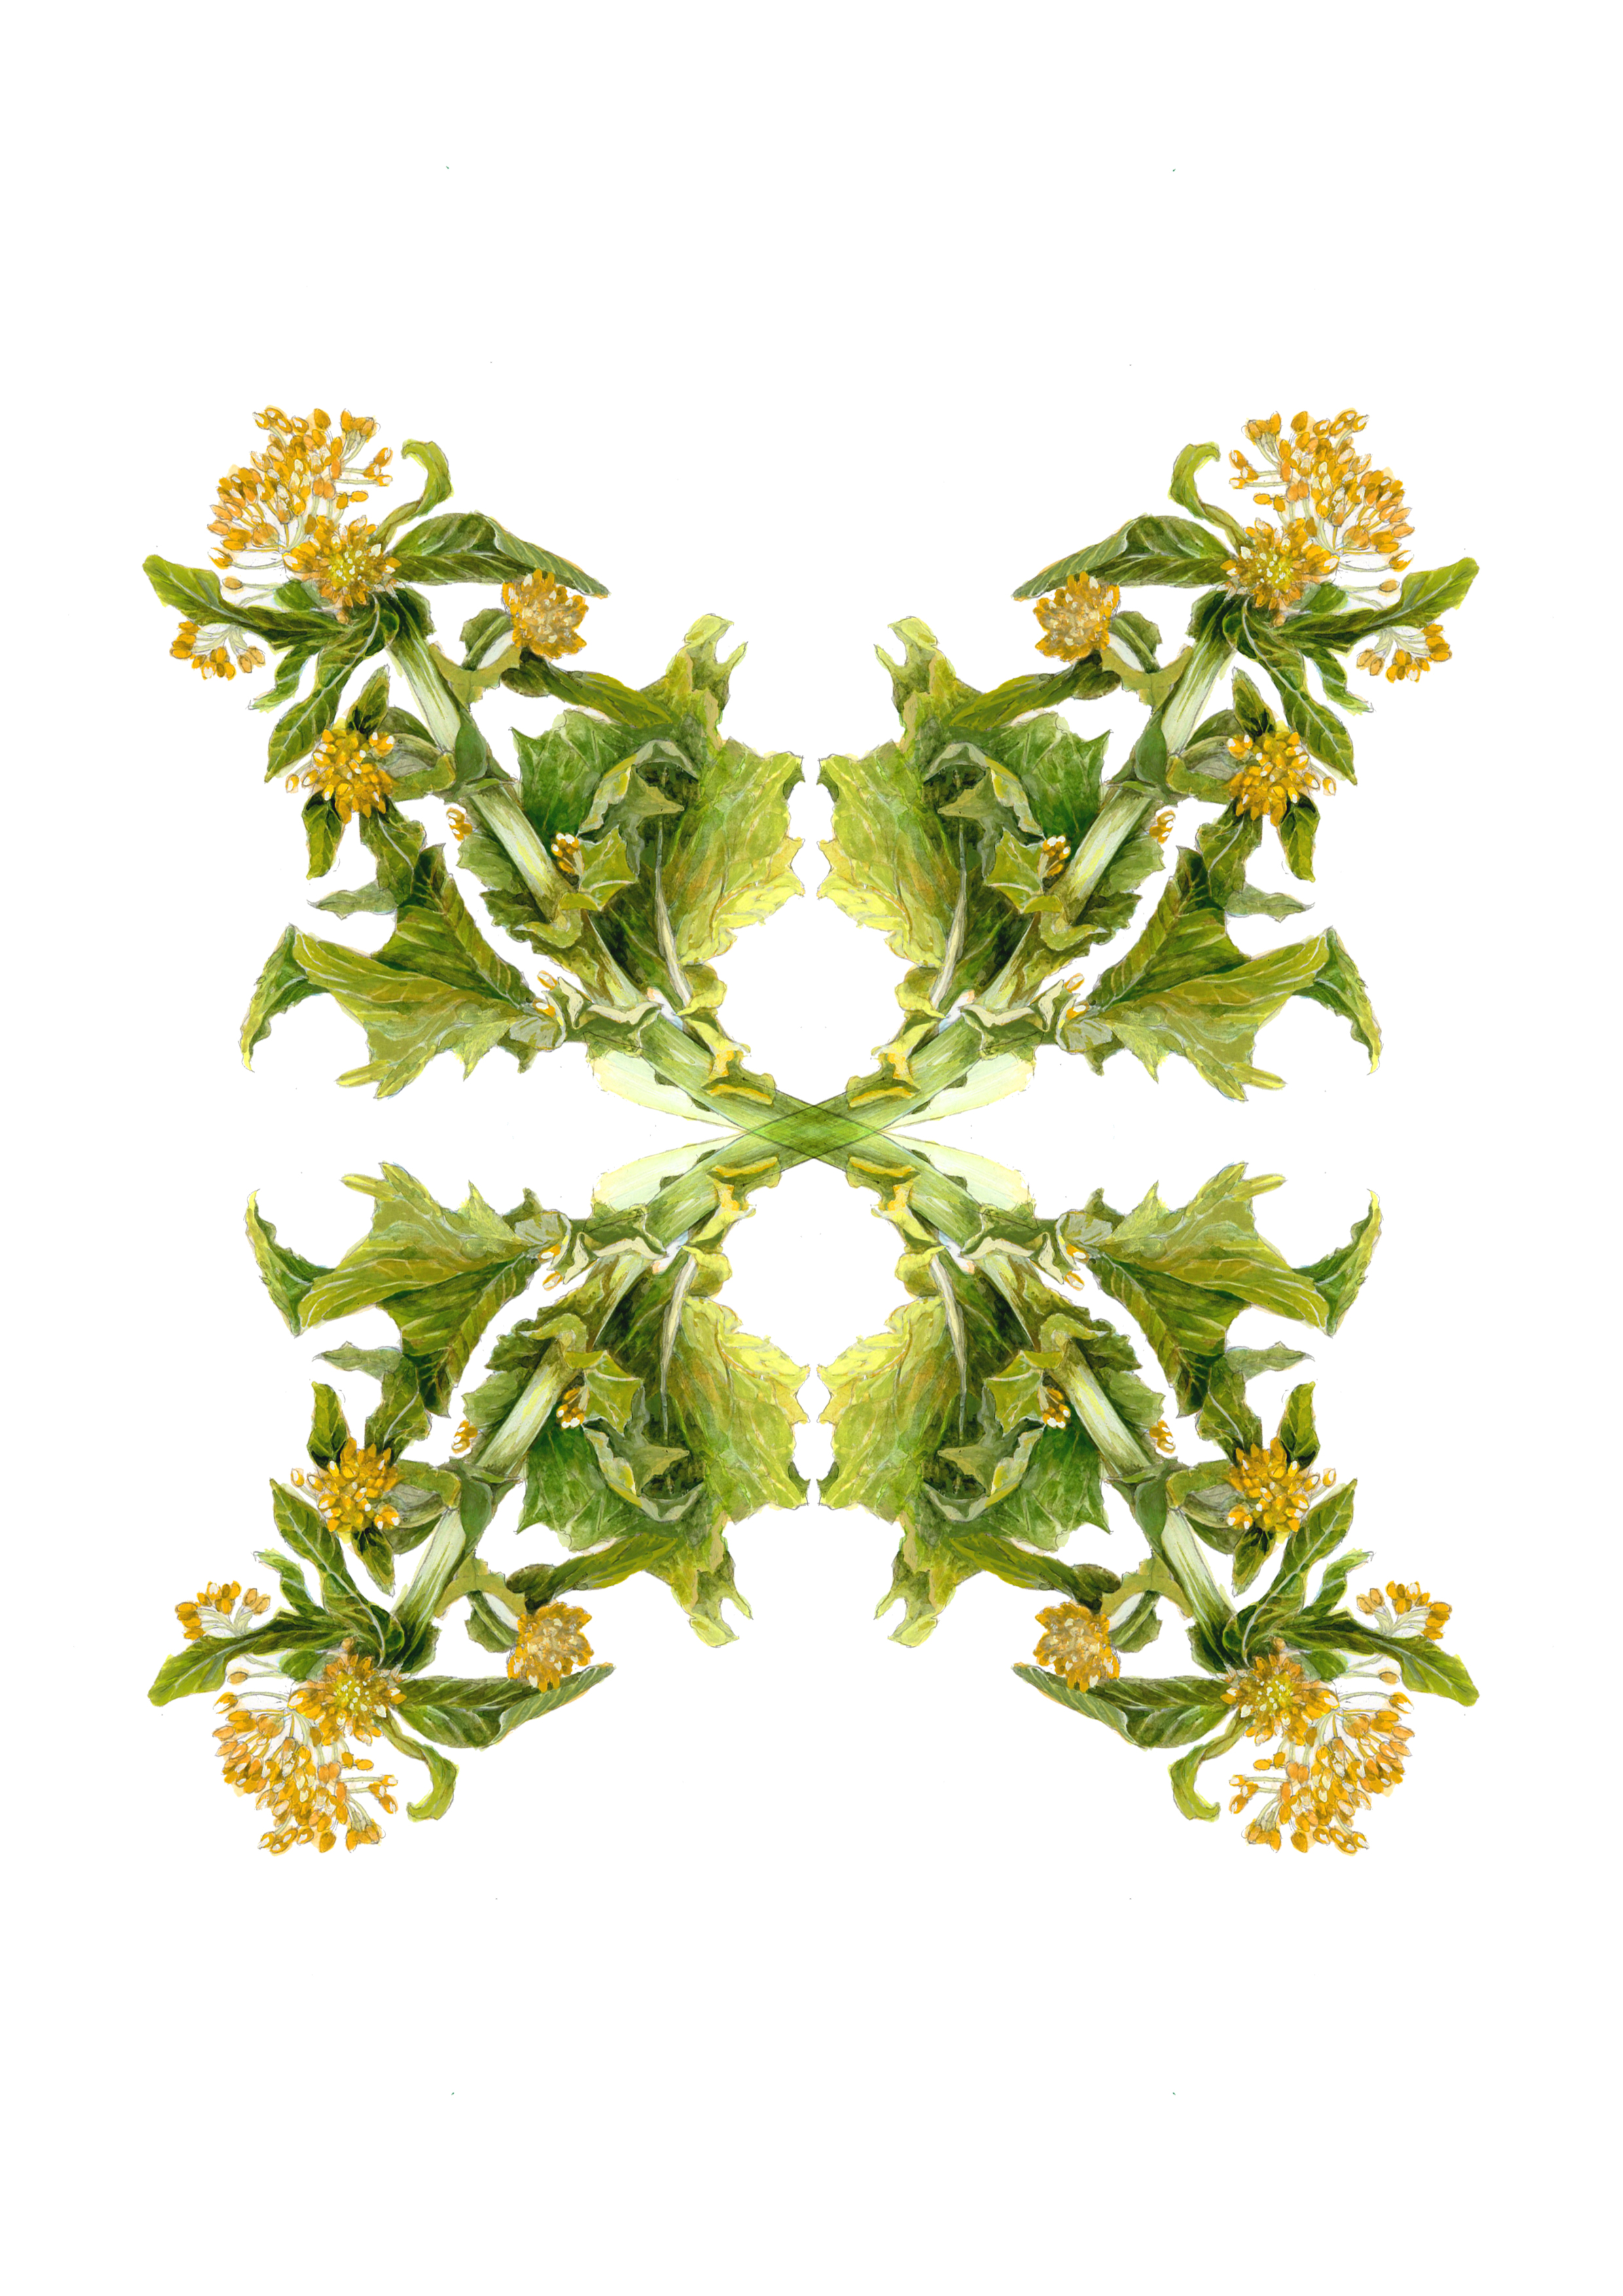 plants34